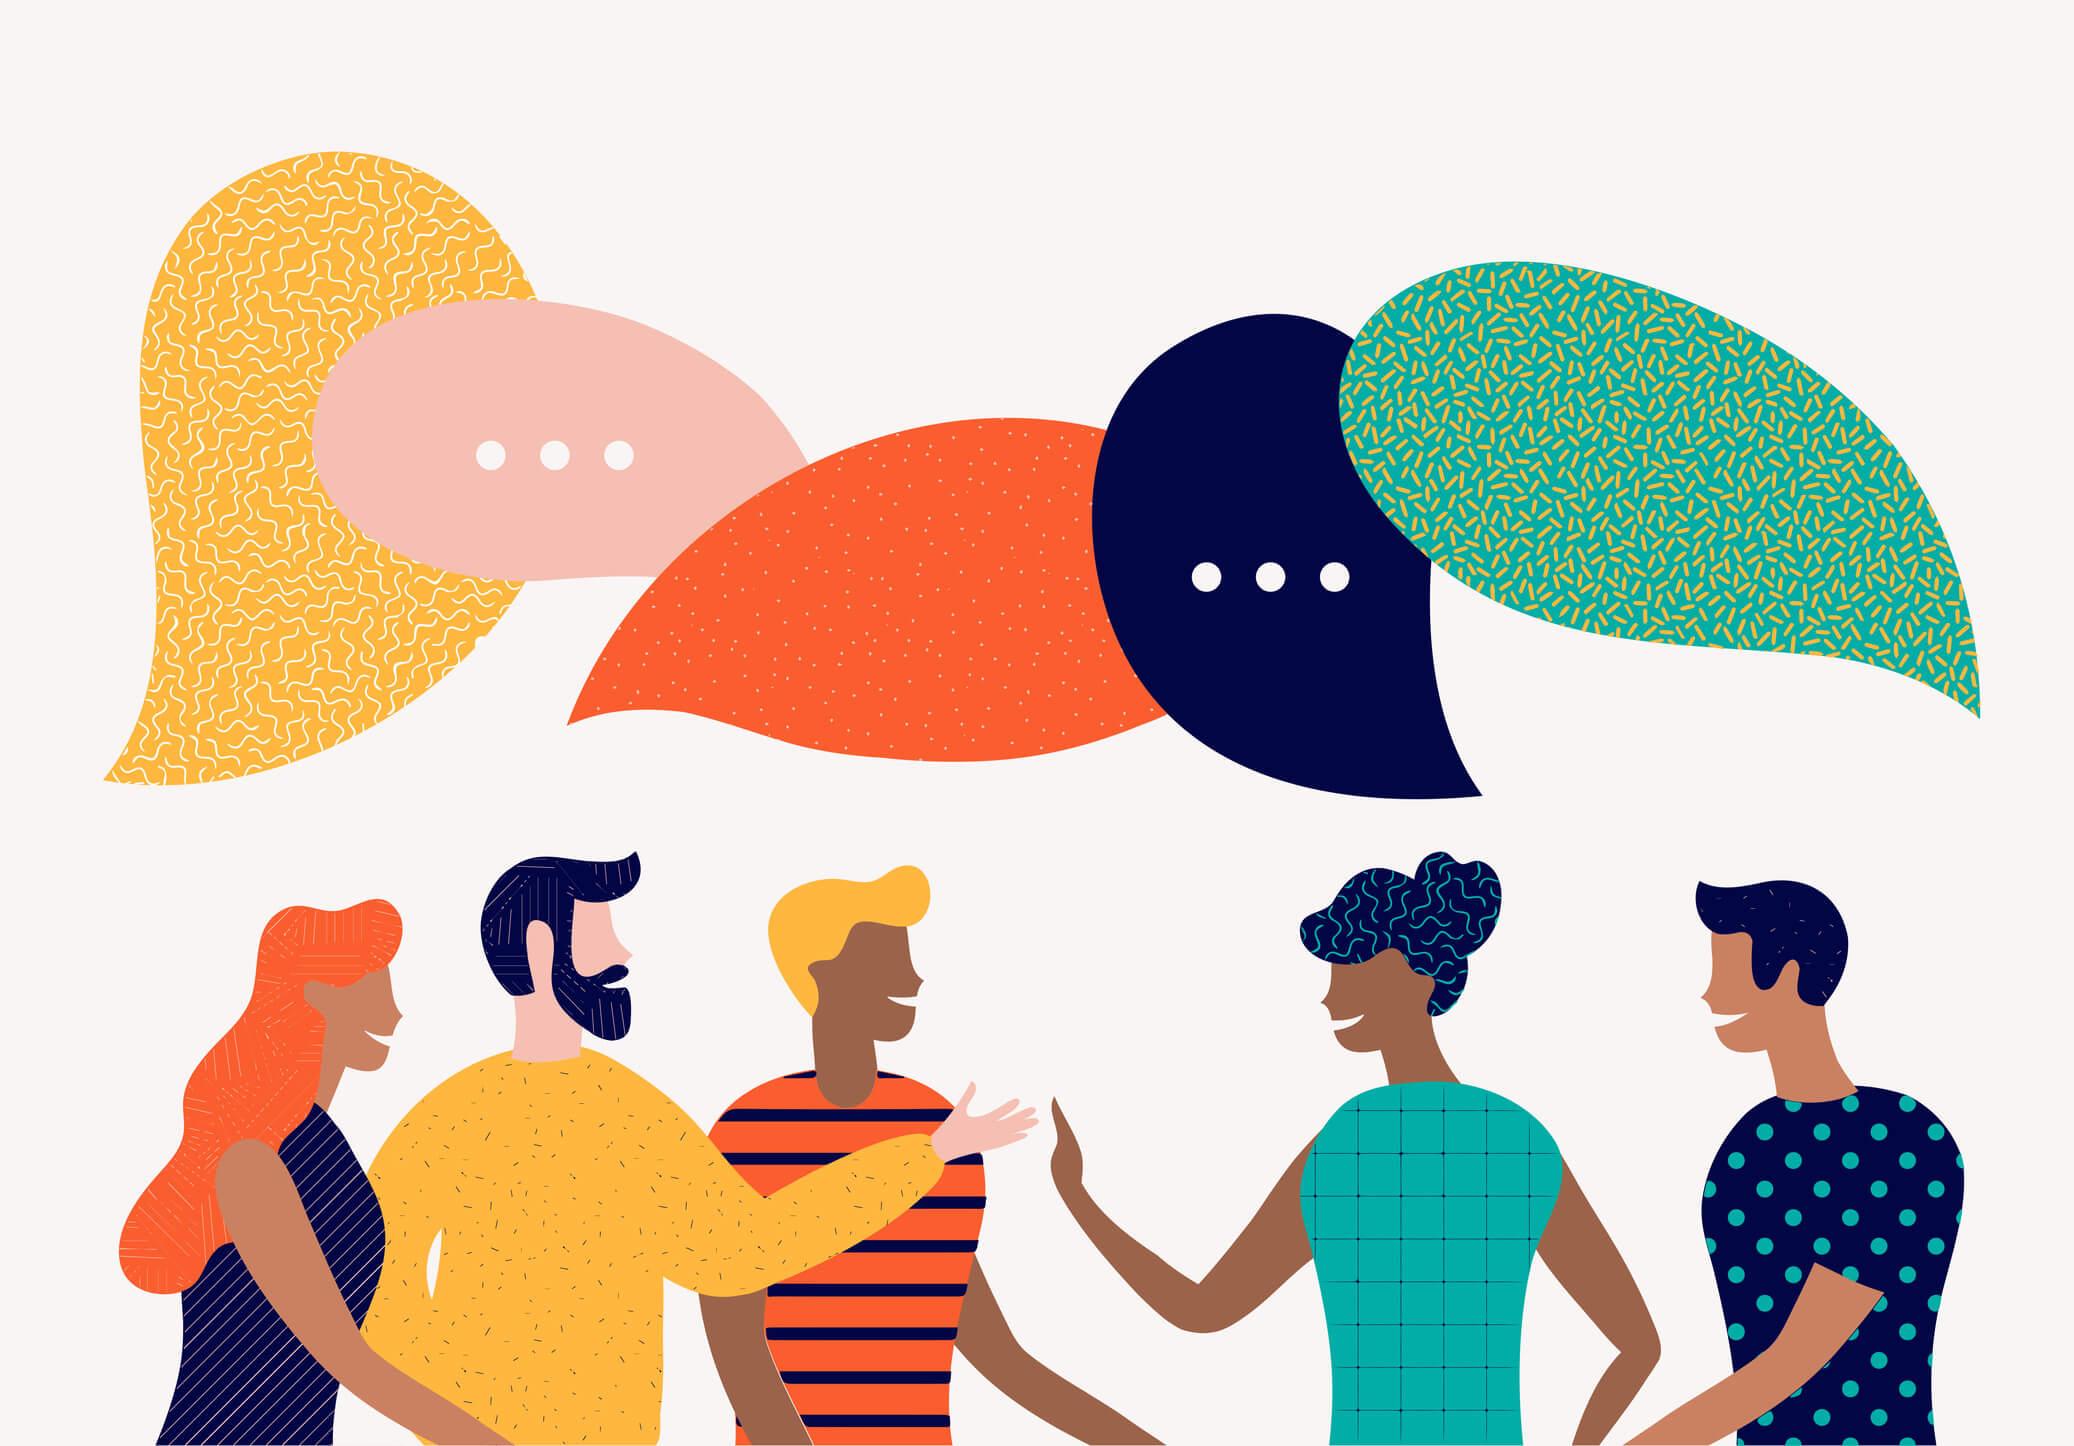 ArchiMate meeting conversation